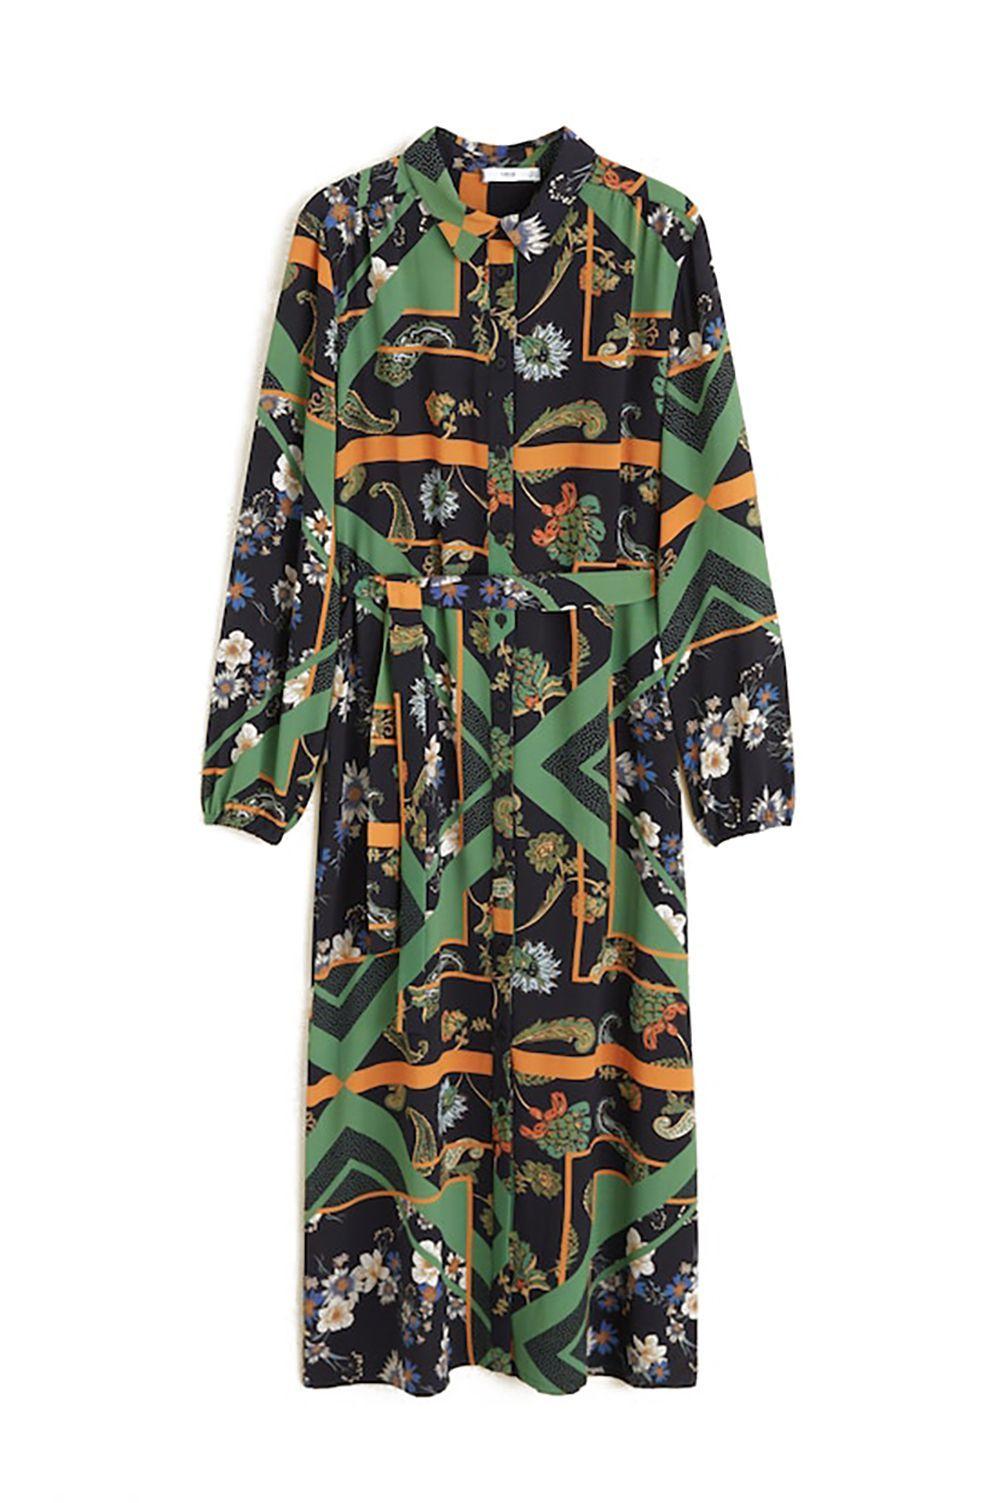 Scarf Print Shirt Dress Mango mango.com $99.99 SHOP IT